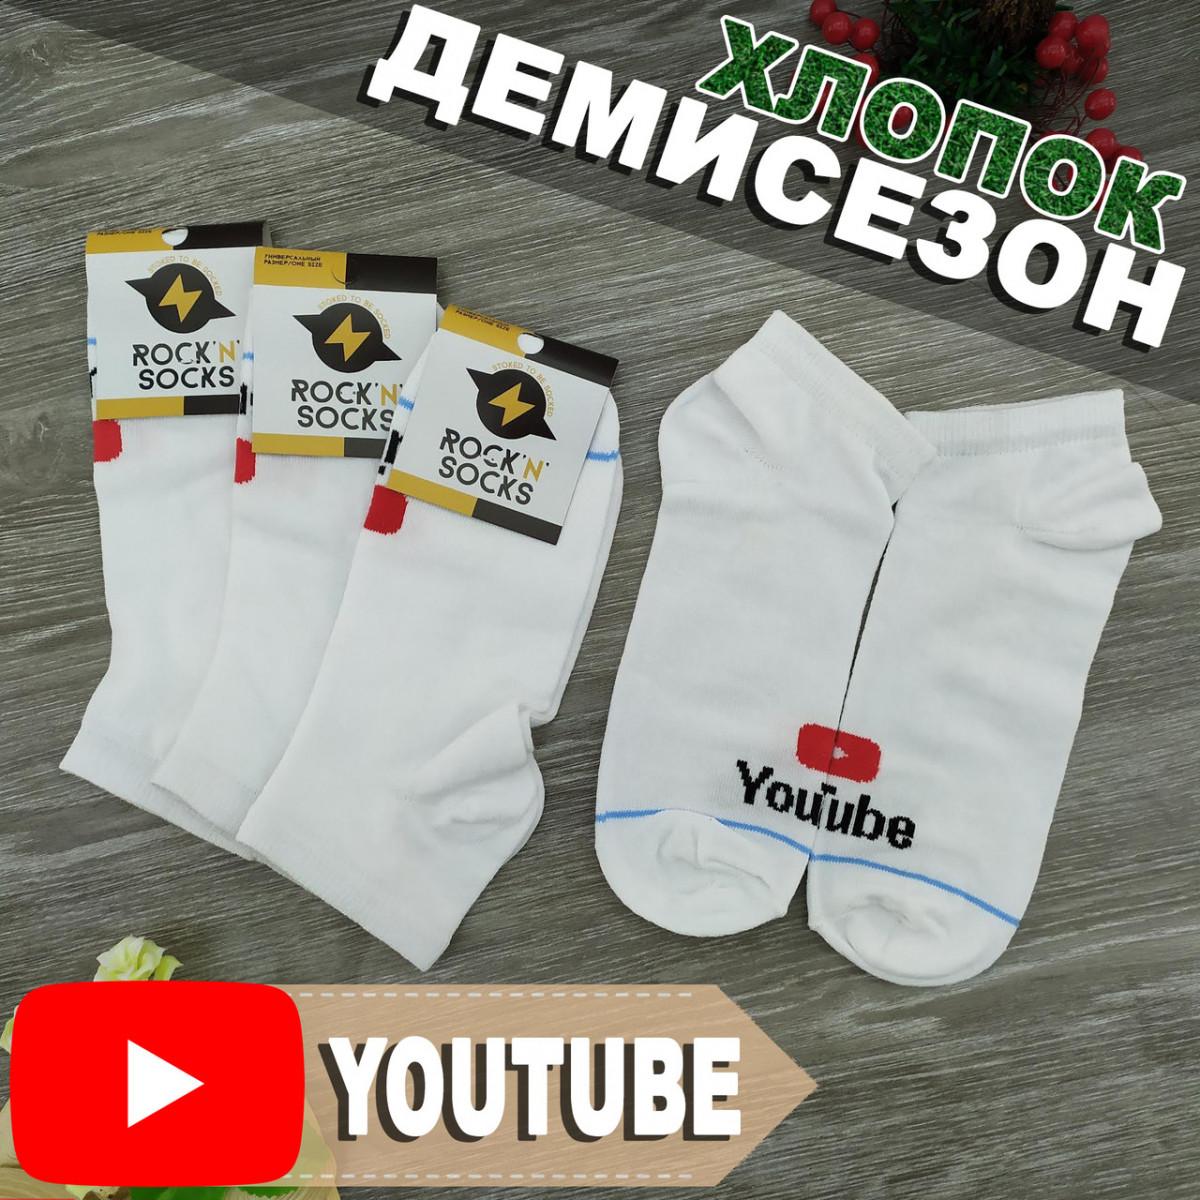 Носки с приколами демисезонные короткие Rock'n'socks 445-26 Украина one size (37-44р) 20033712